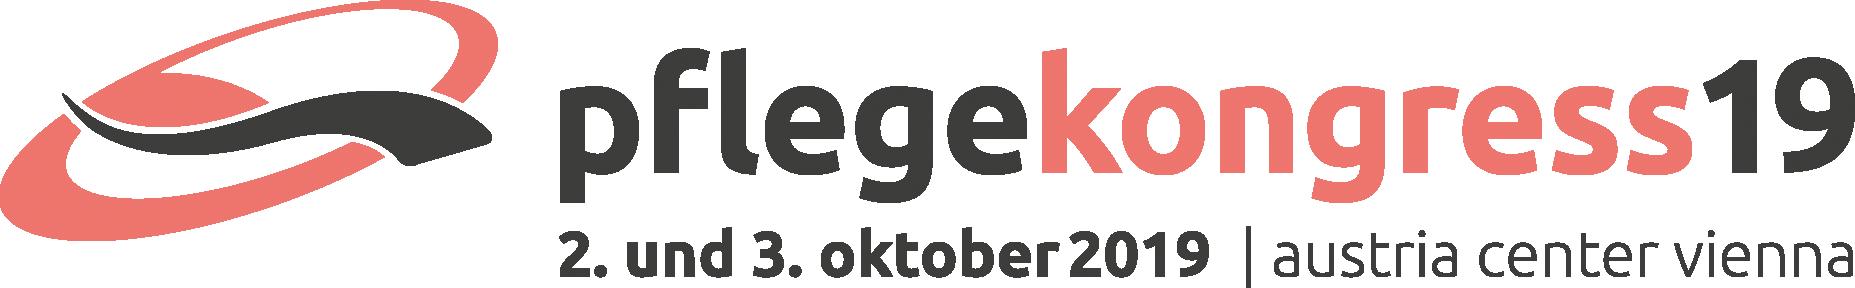 pflegekongress19-banner